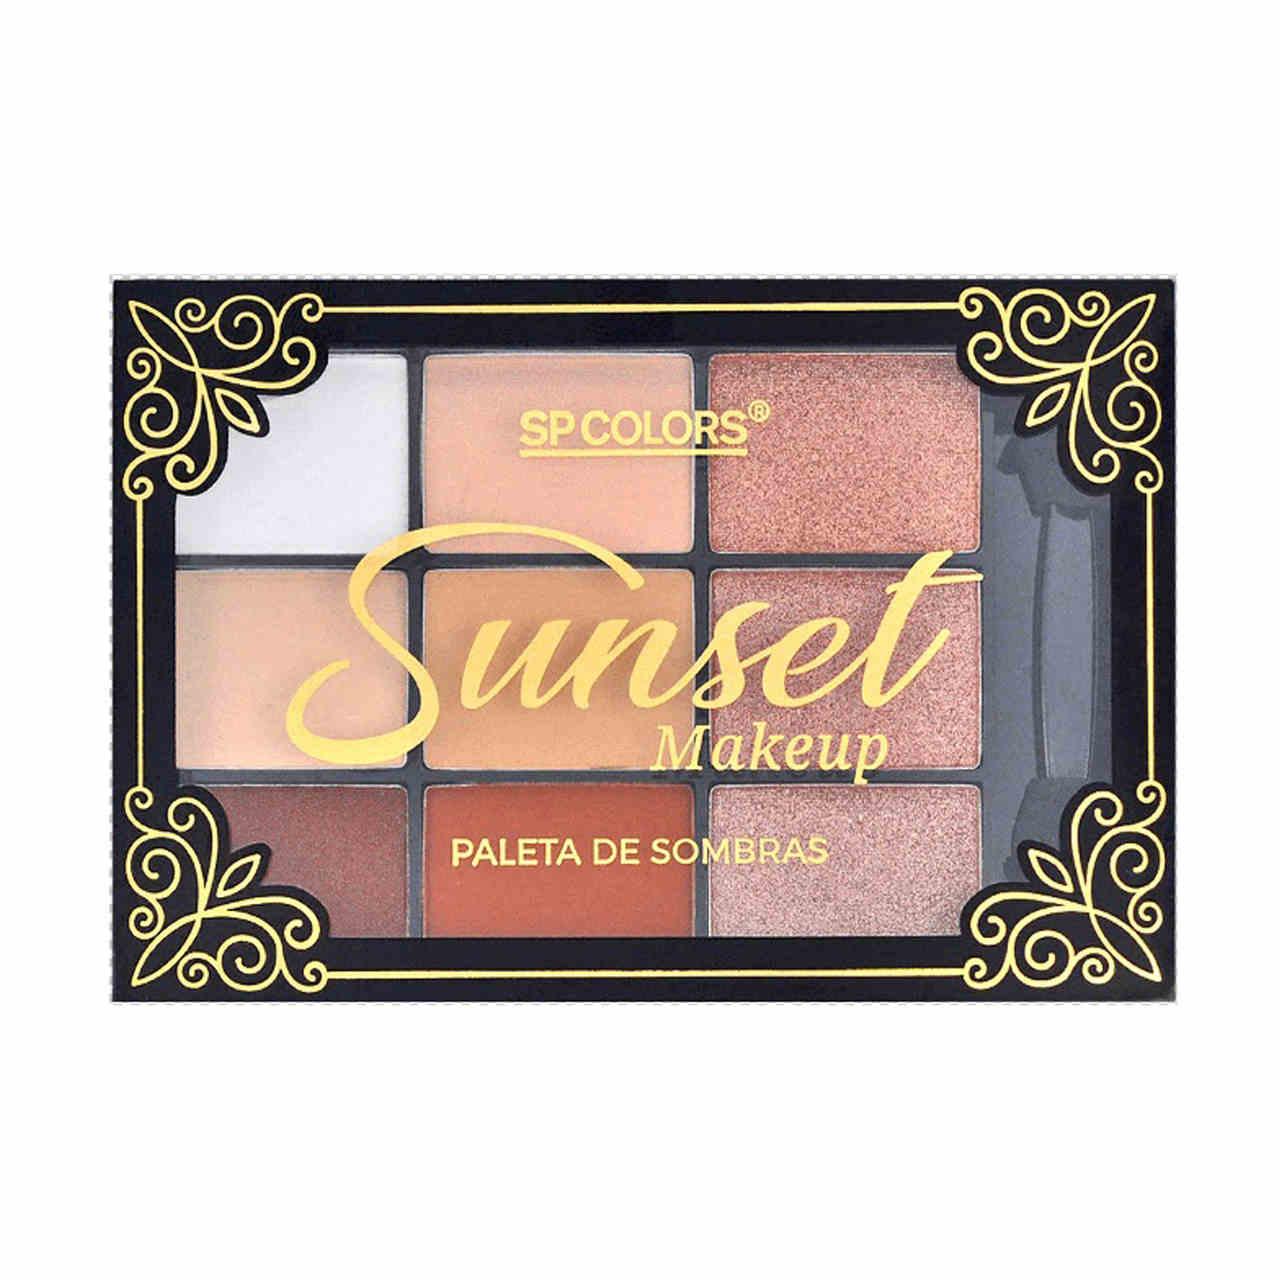 Paleta de Sombras Sunset Makeup Sp Colors